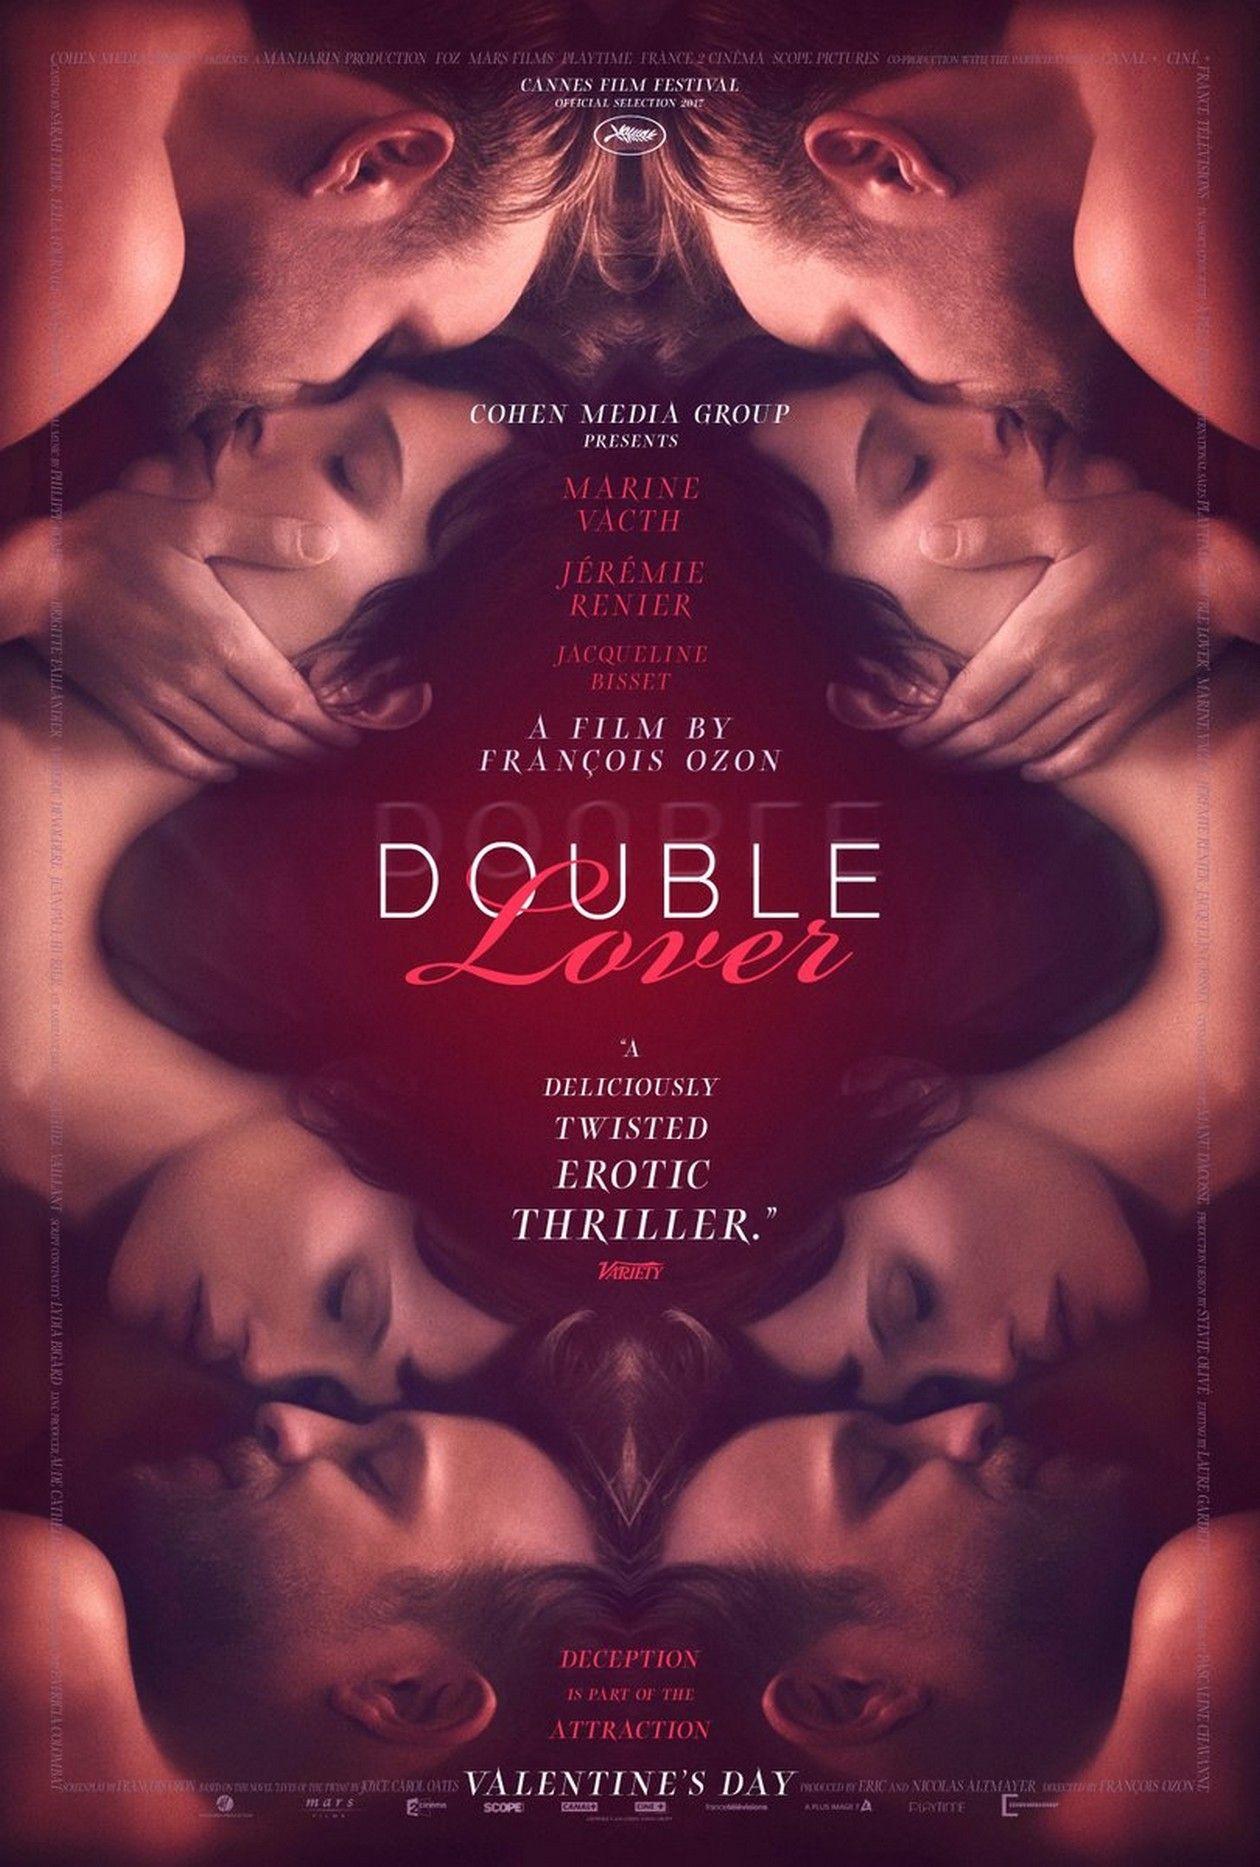 Marine Vacth actress | Double Lover / François Ozon / US MOVIE POSTER / Affiche américaine du film / VALENTINE'S DAY